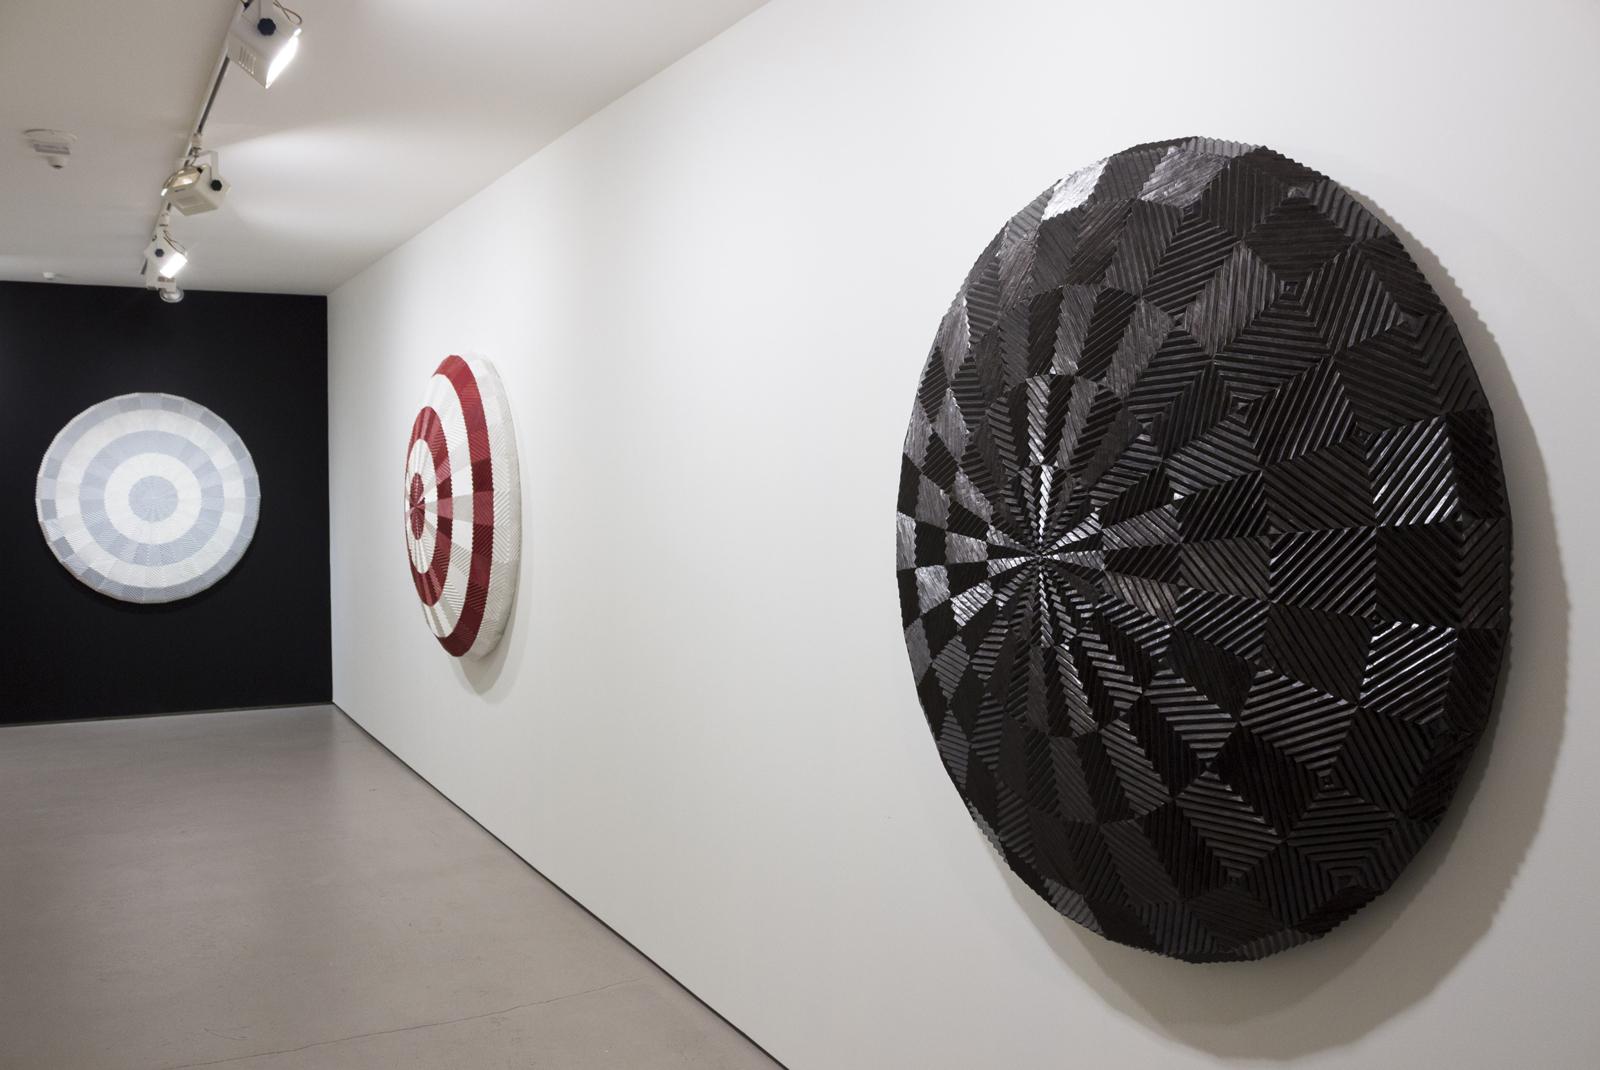 Resettle series (installation view), by New Zealand artist Brett Graham